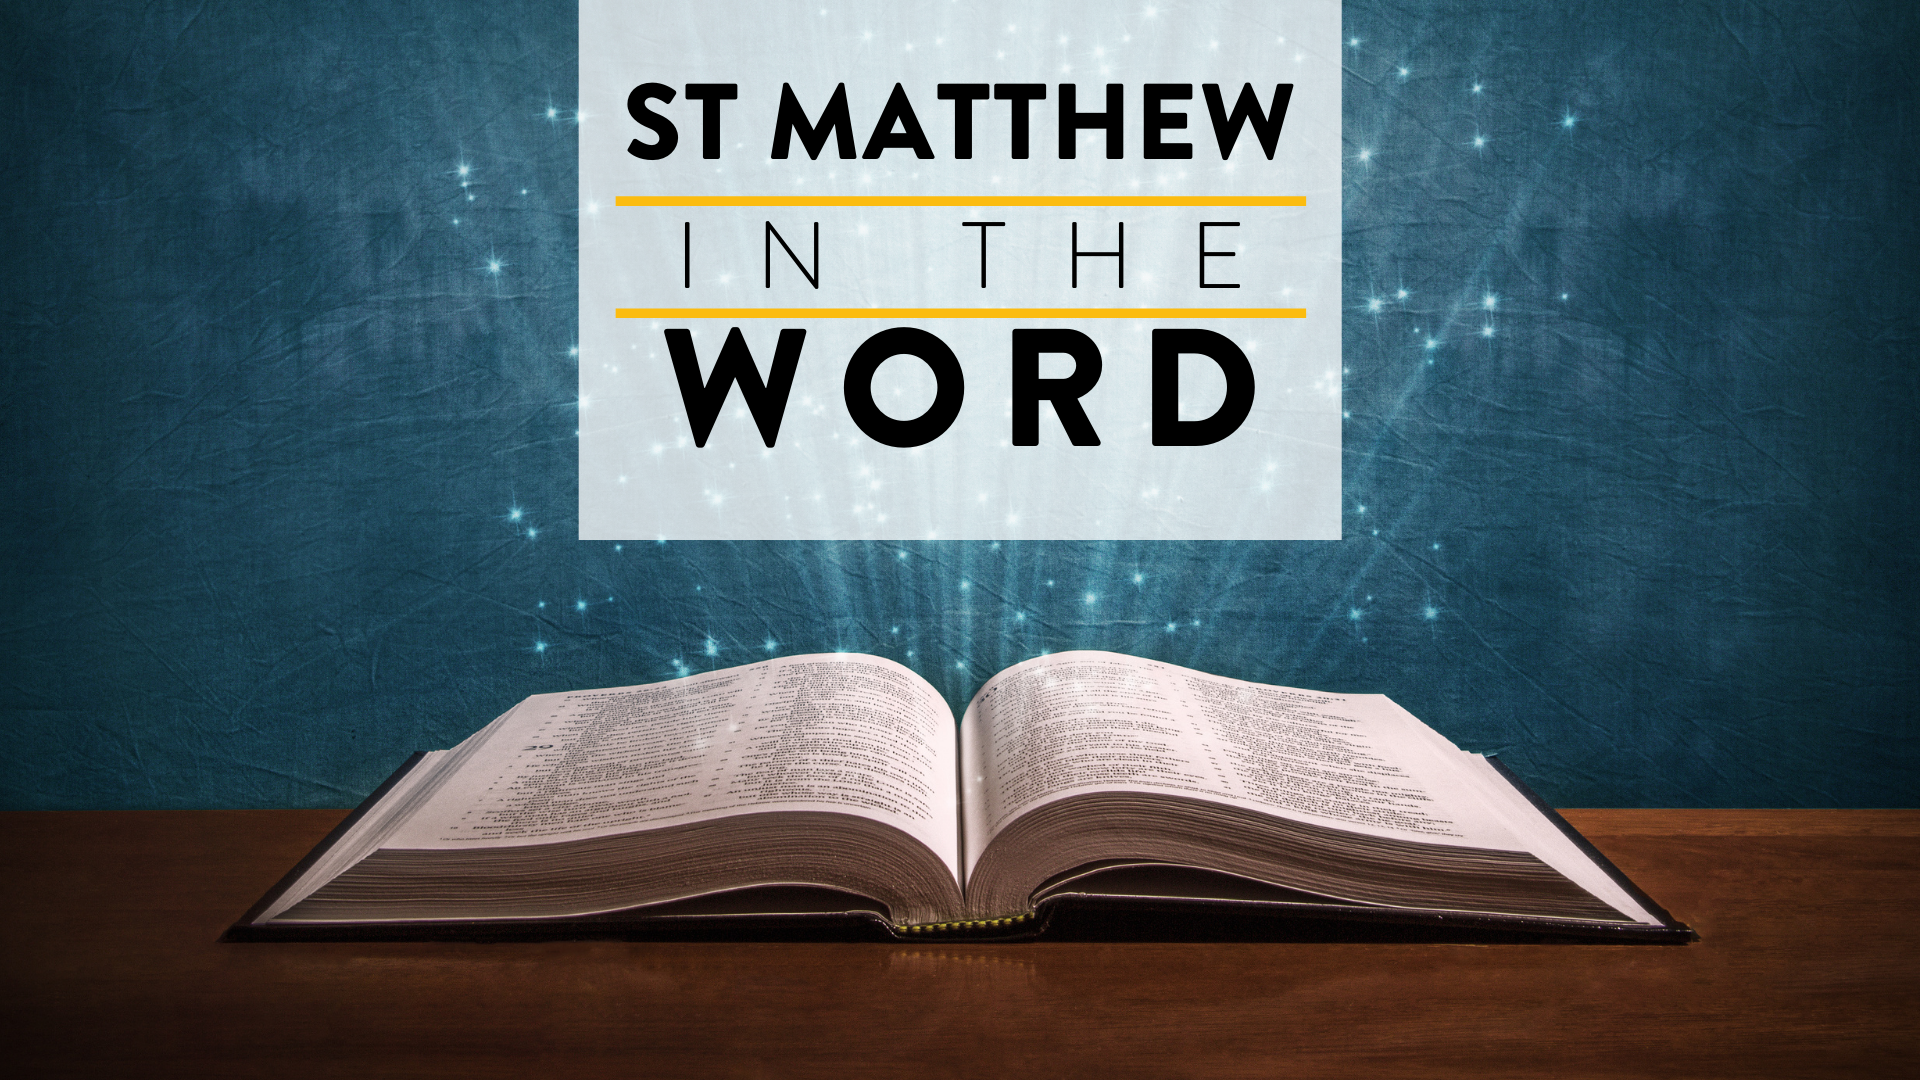 St Matthew in the Word: Genesis 4